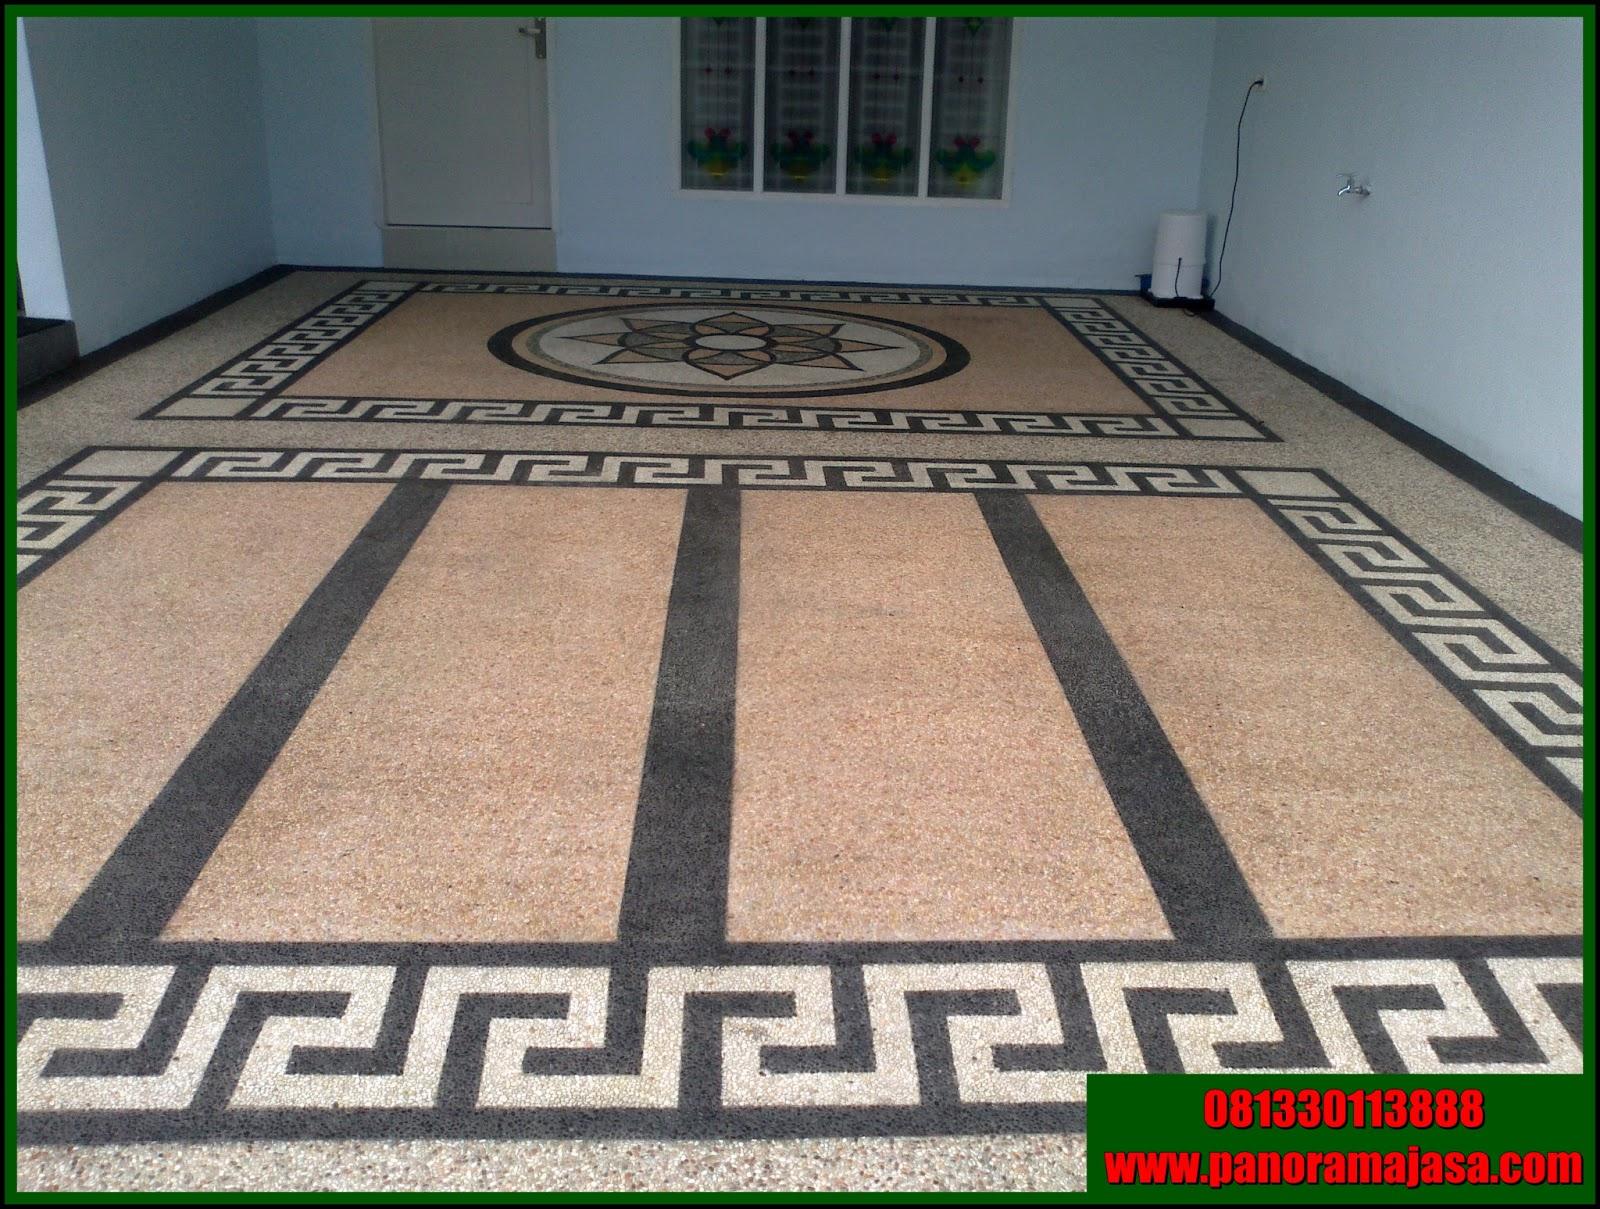 lantai carport bermotif membuat ruang luar ini lebih menarik motif